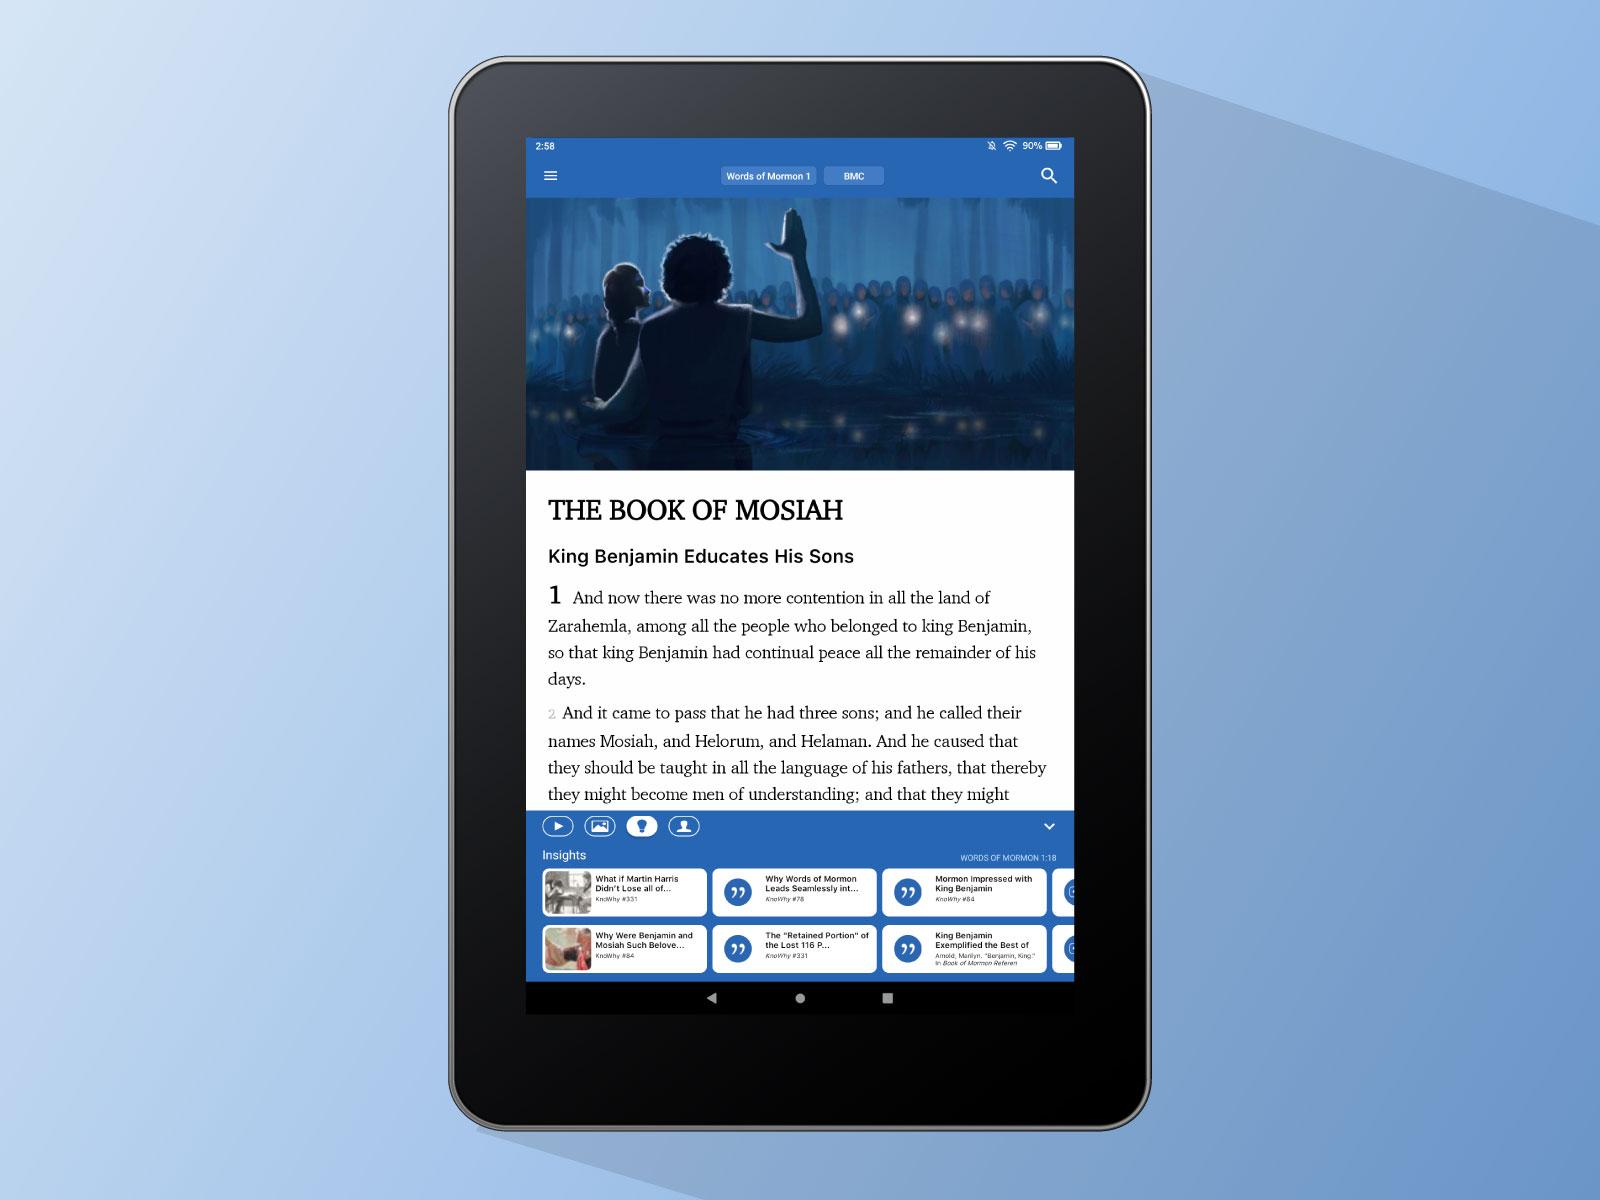 Mosiah 1 in ScripturePlus on Amazon Kindle